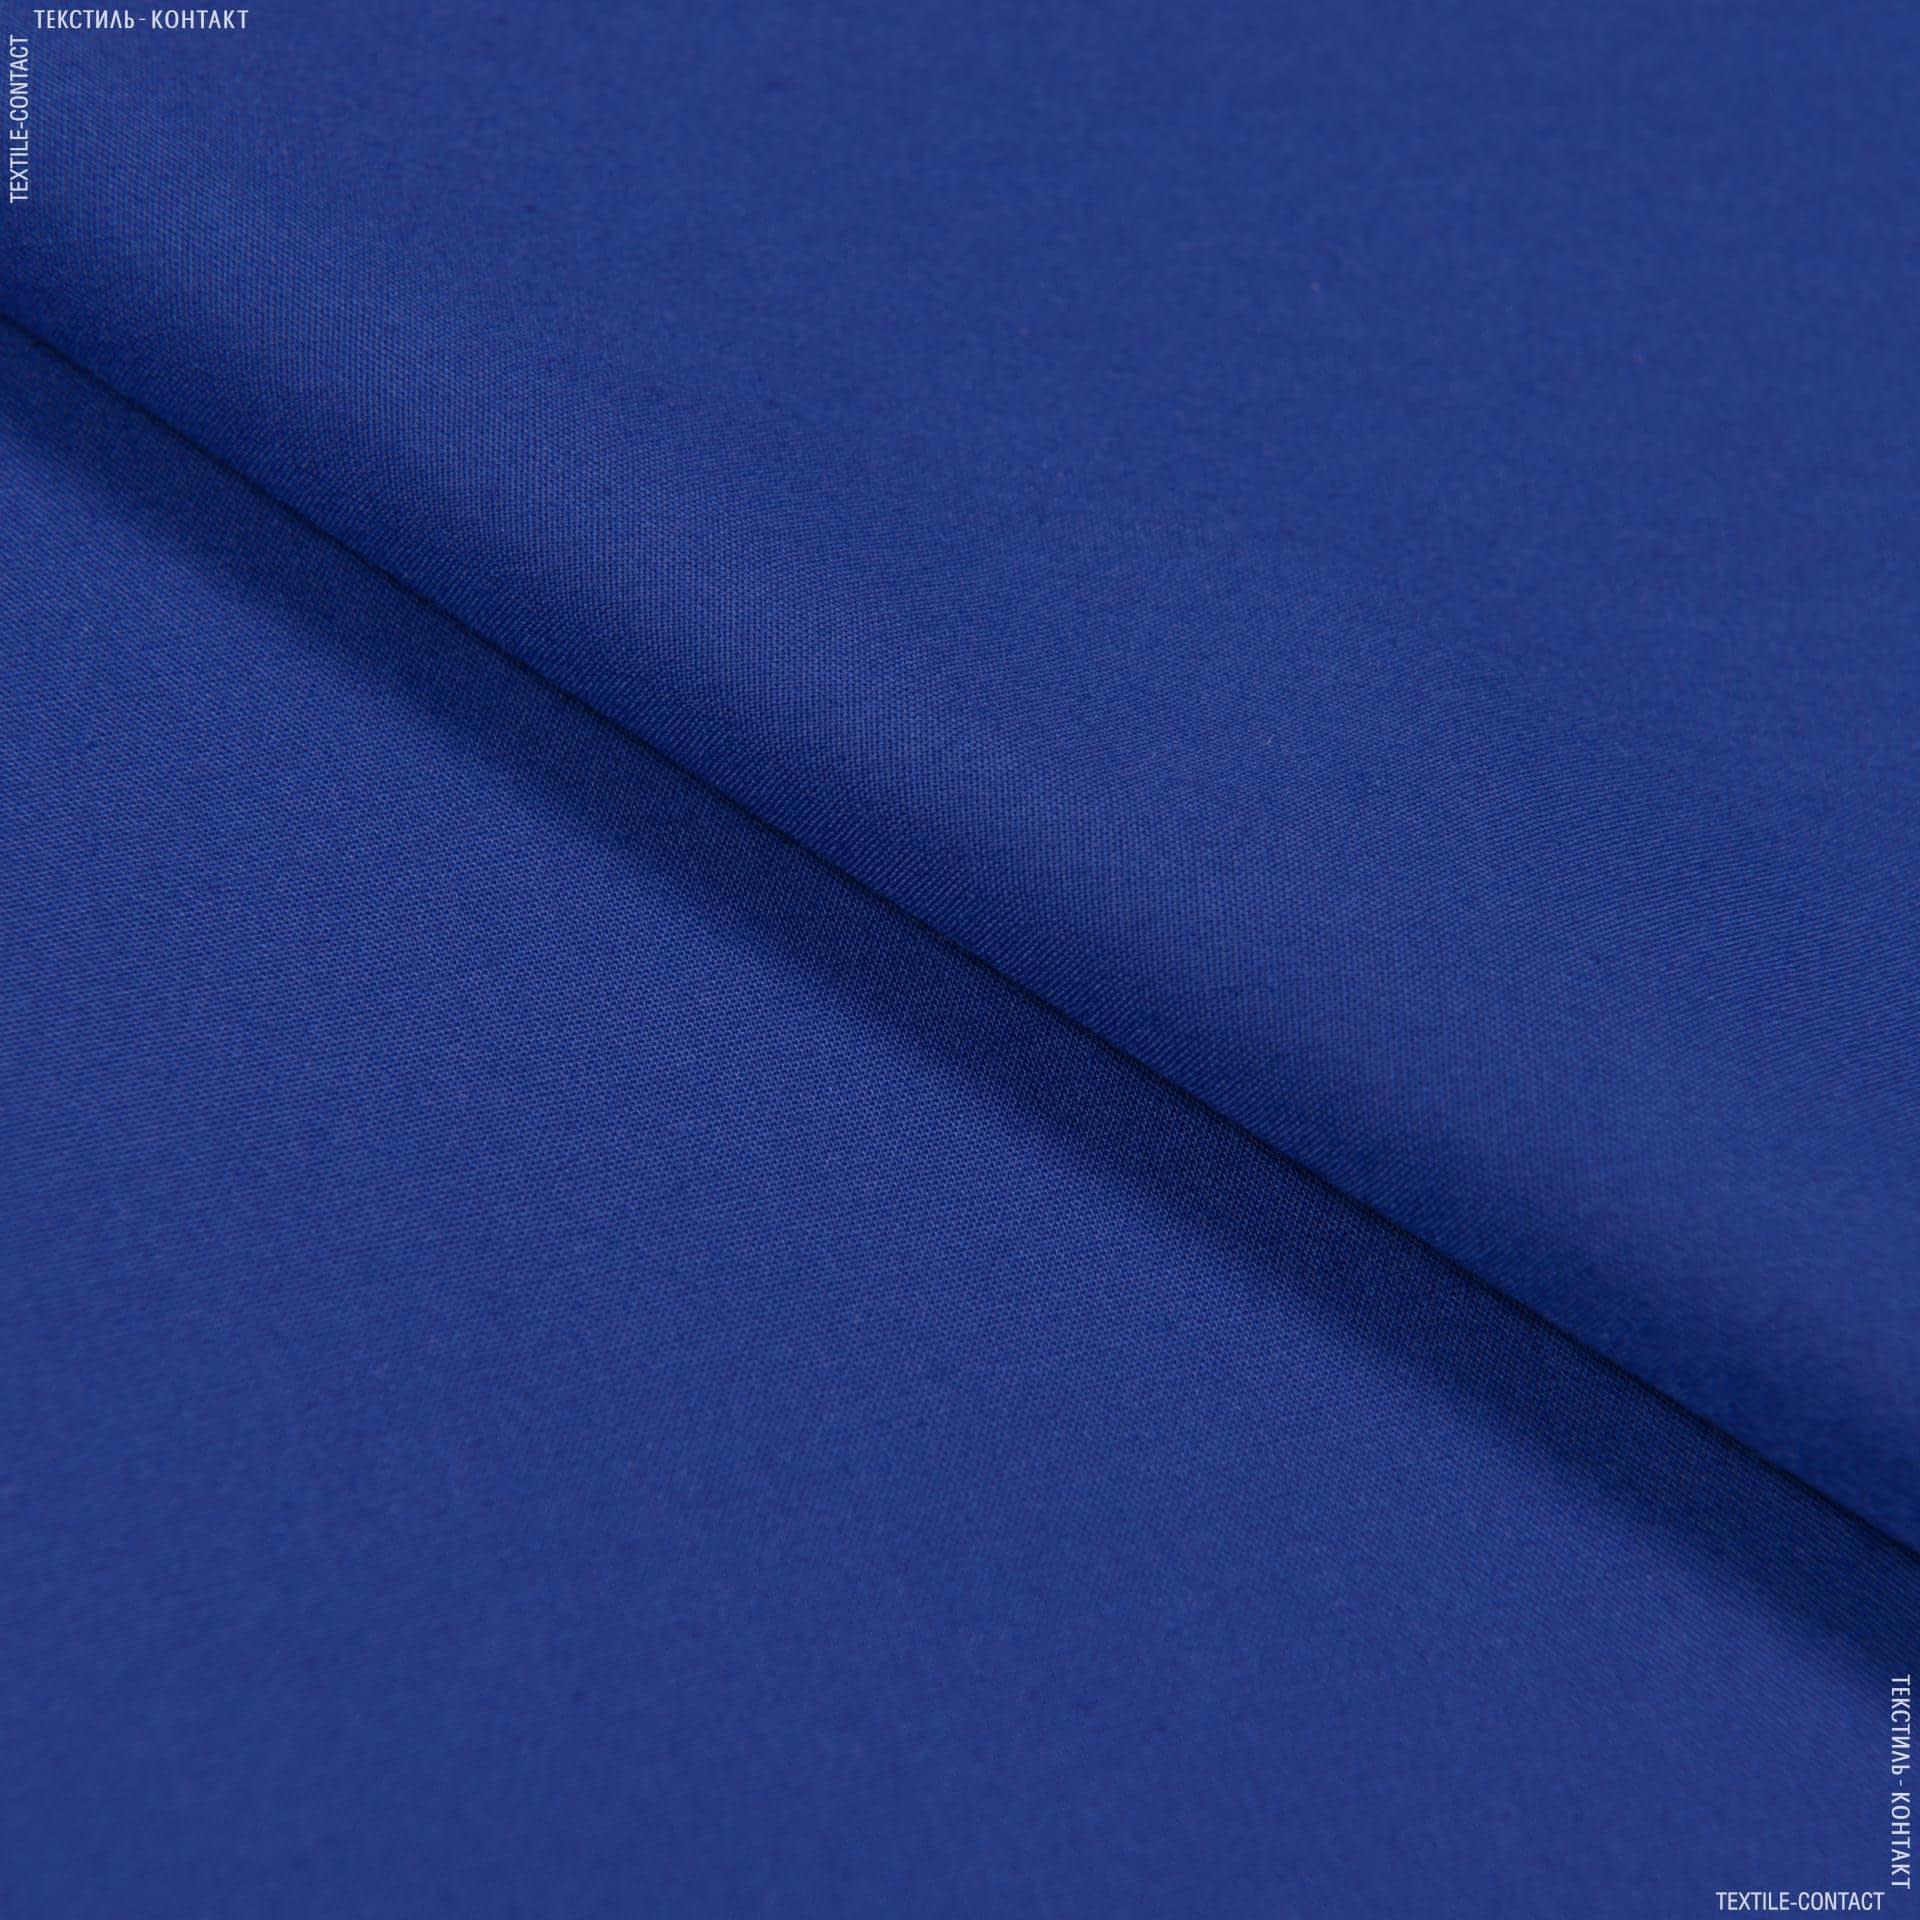 Тканини для хусток та бандан - Сорочкова електрик